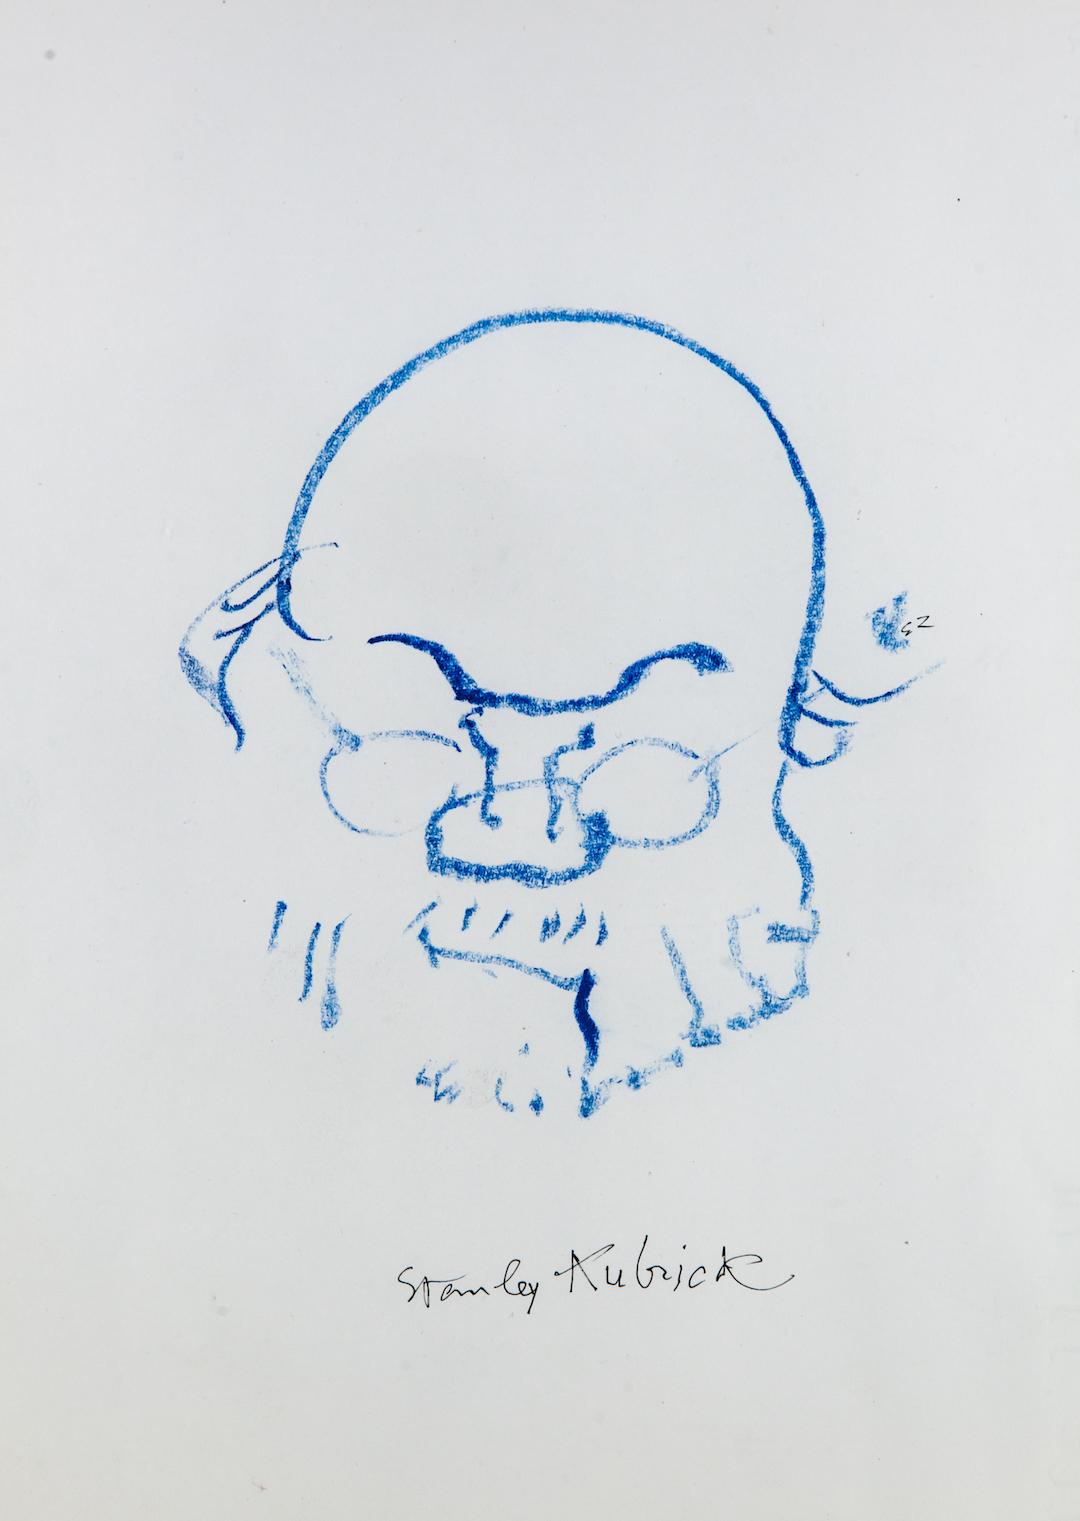 Stanley Kubrick, caricatura